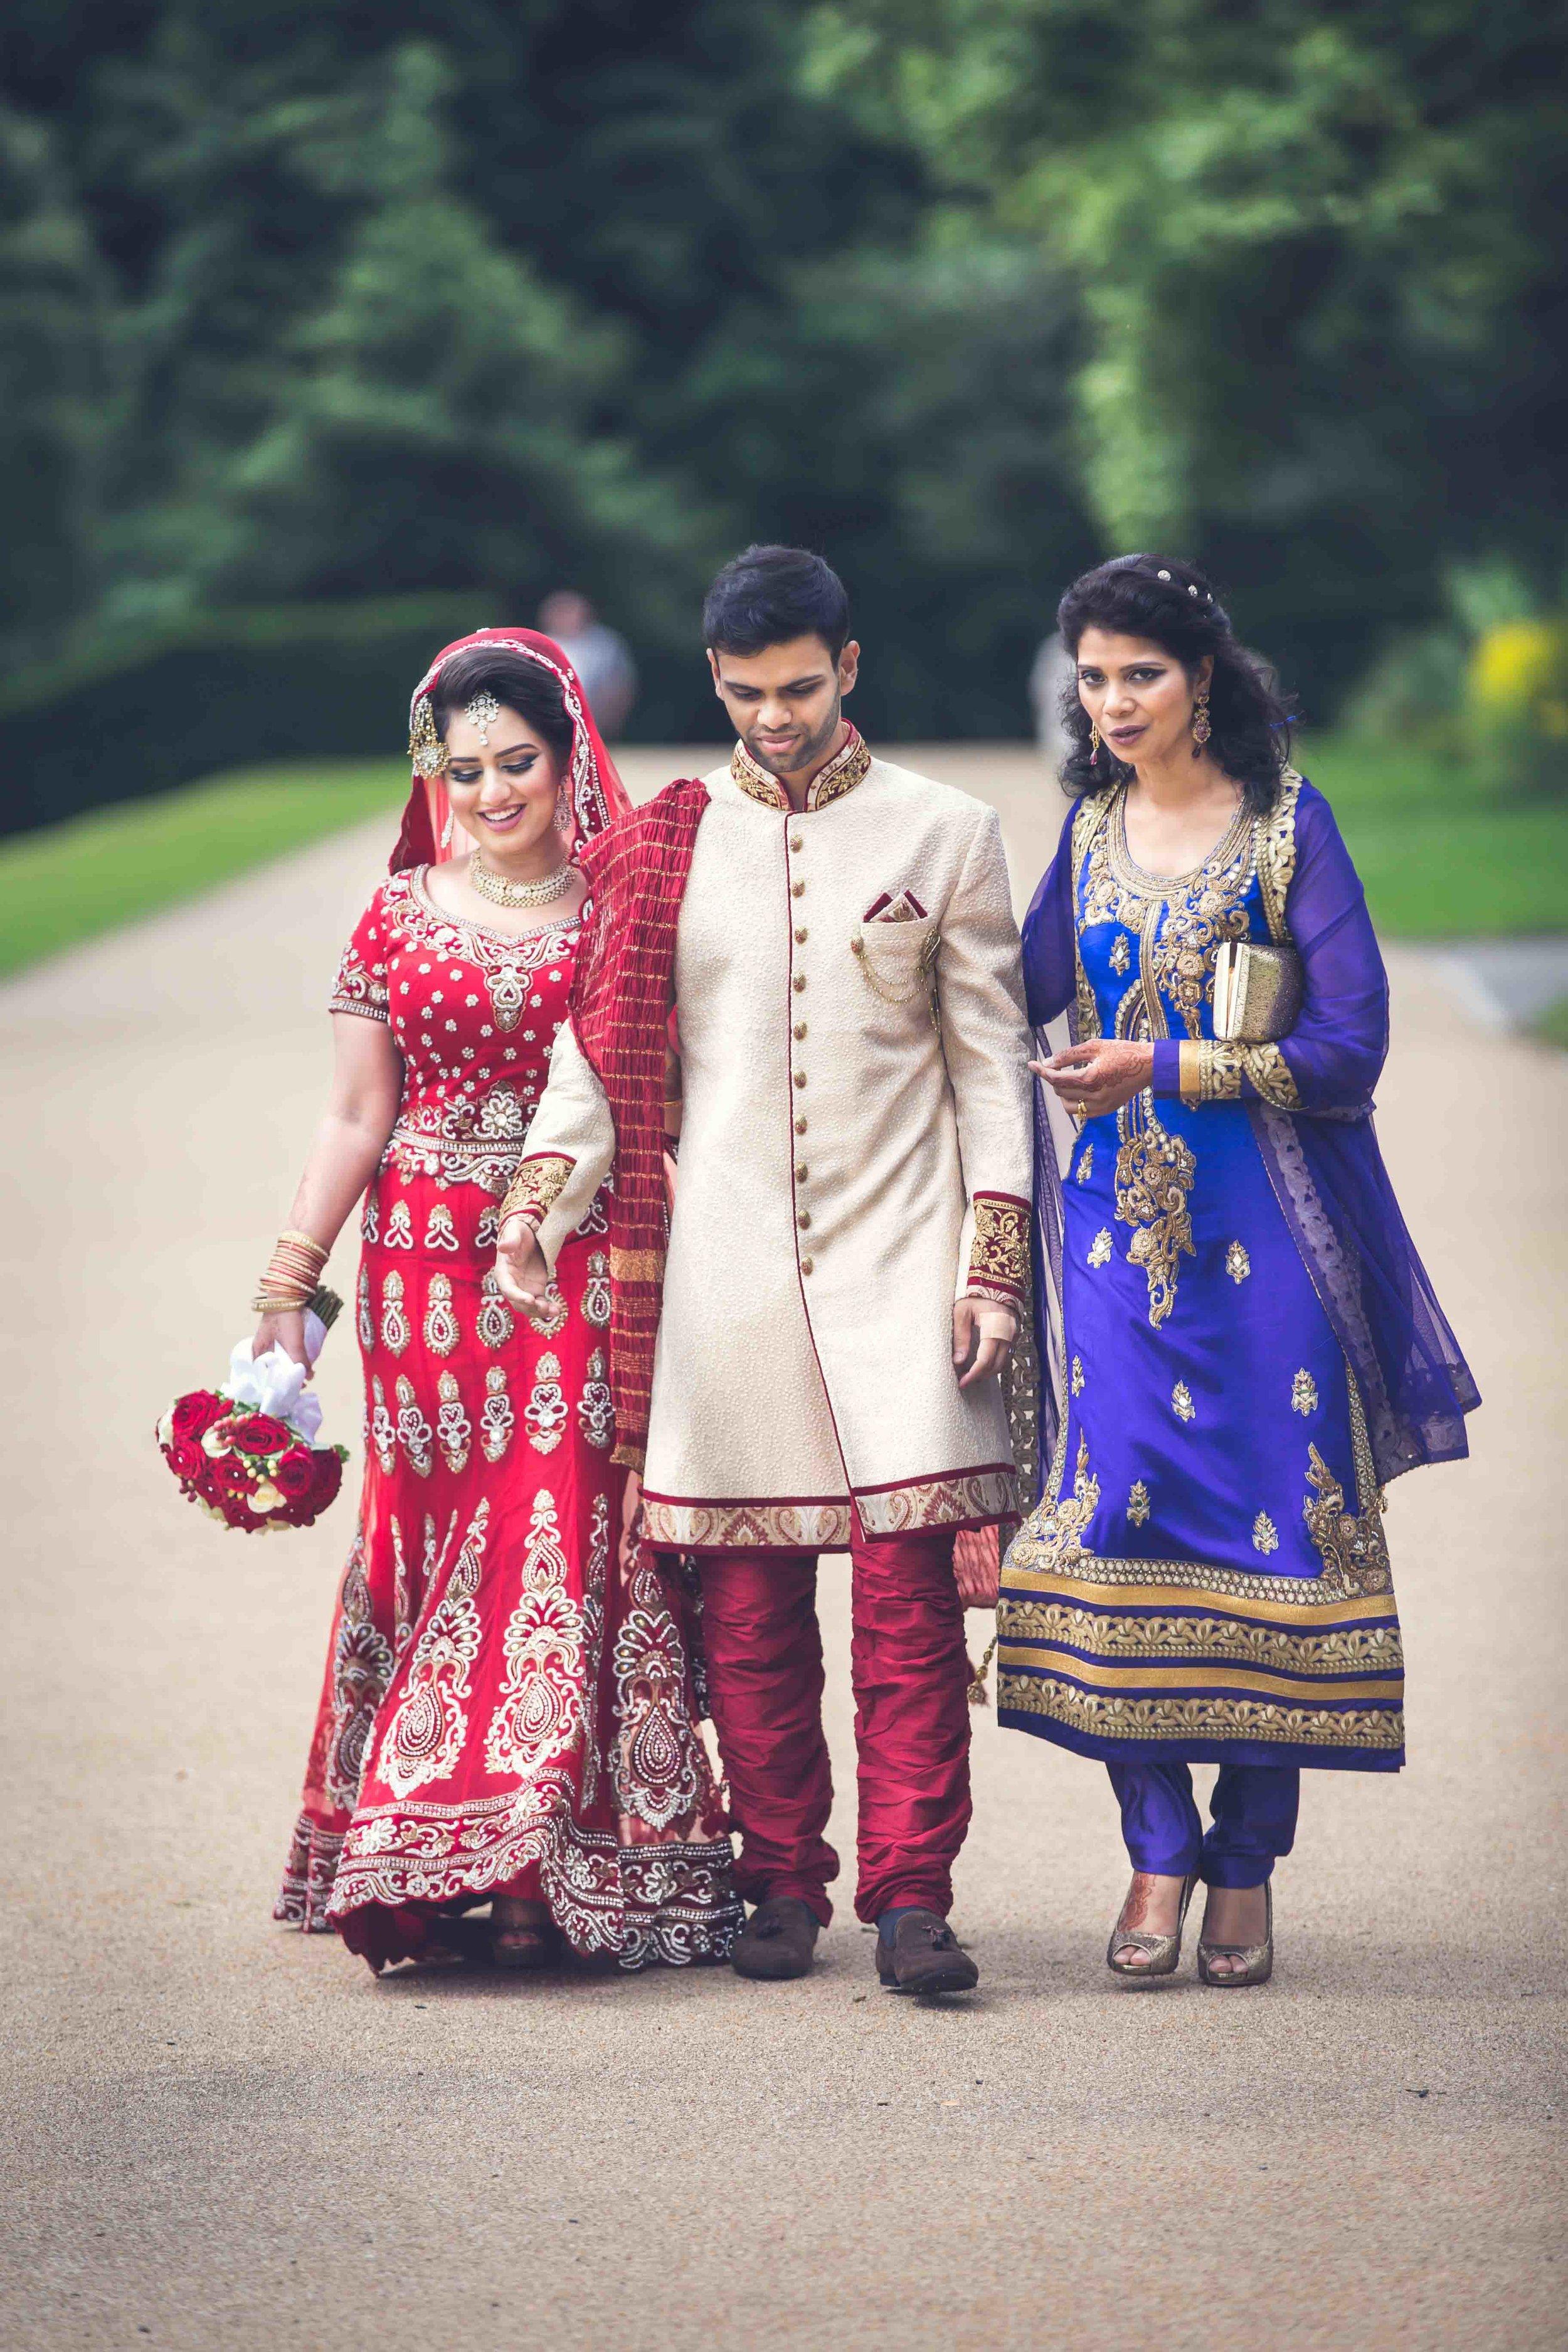 Asian Wedding Photographer Opu Sultan Photography Lyme Park Scotland Edinburgh Glasgow London Manchester Liverpool Birmingham Wedding Photos prewed shoot Jams & Tams Blod-28.jpg